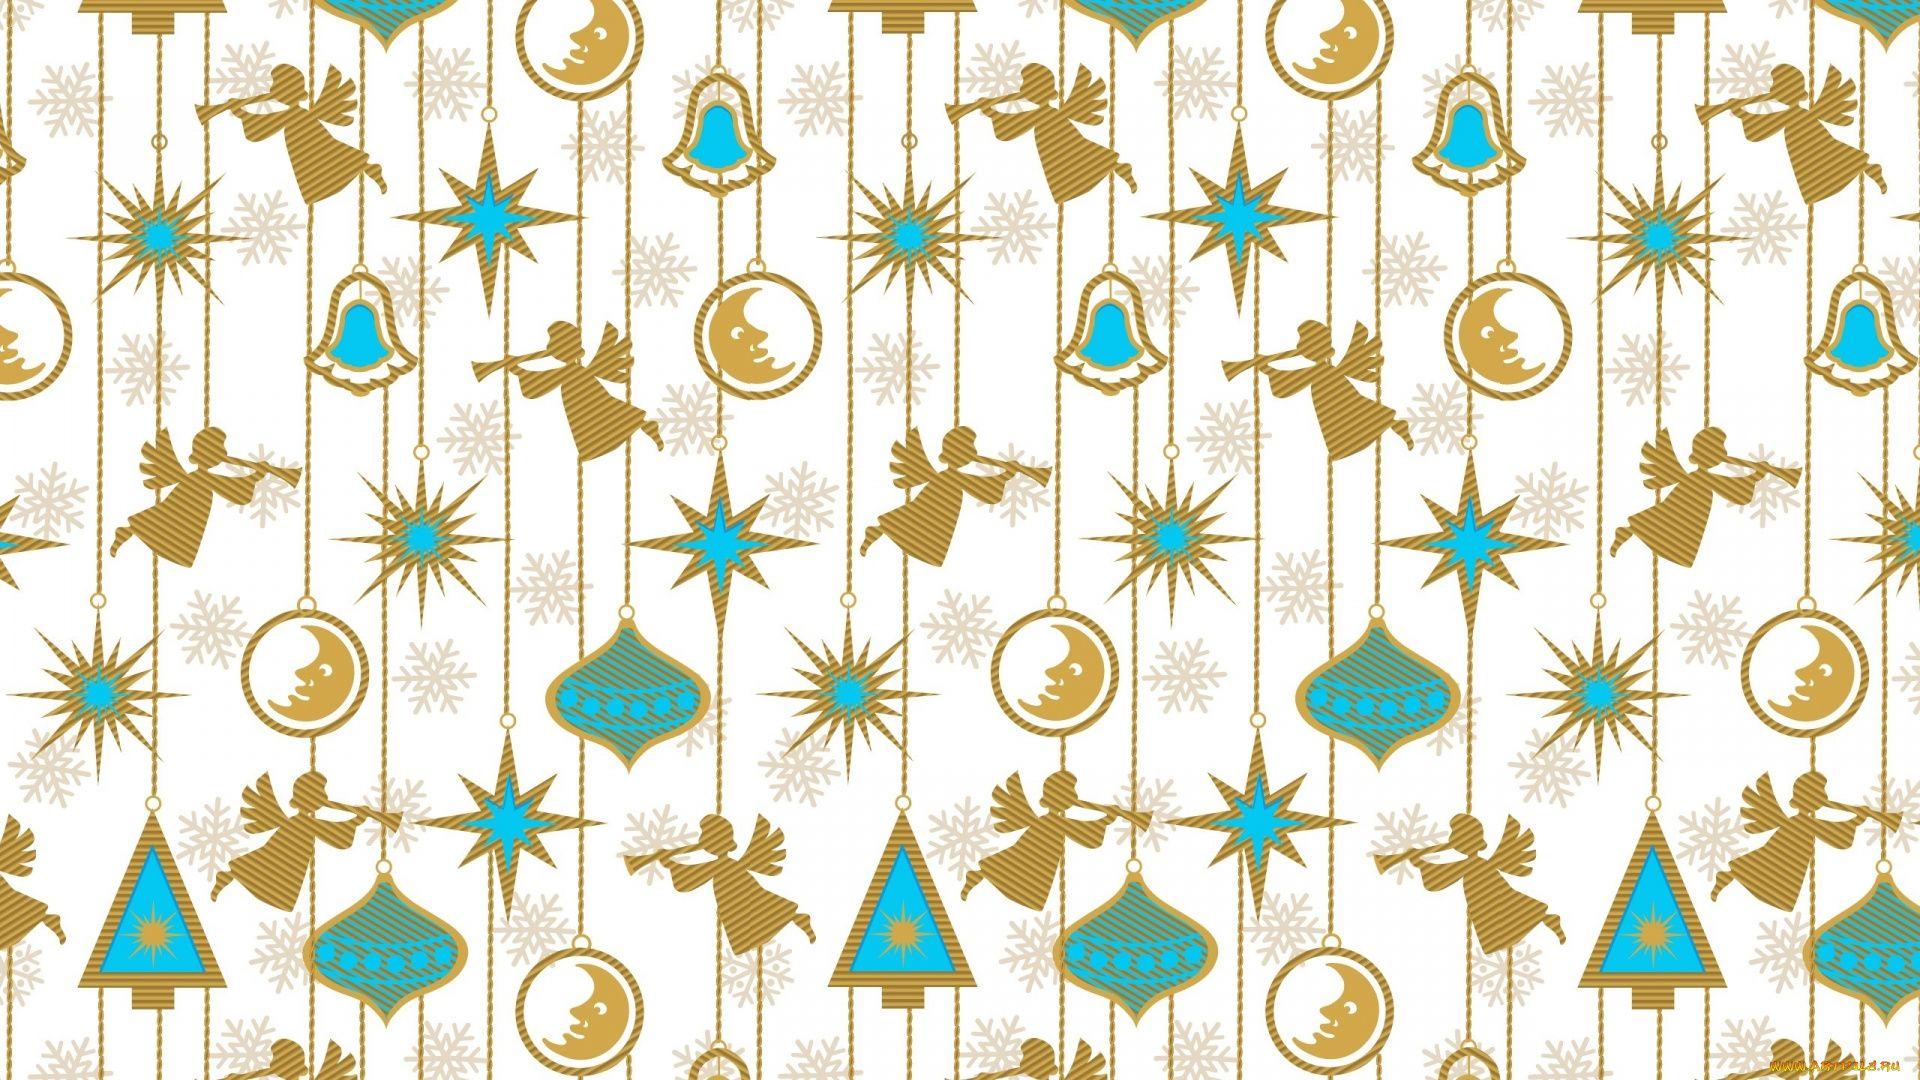 Christmas Scrapbooking hd wallpaper 1080